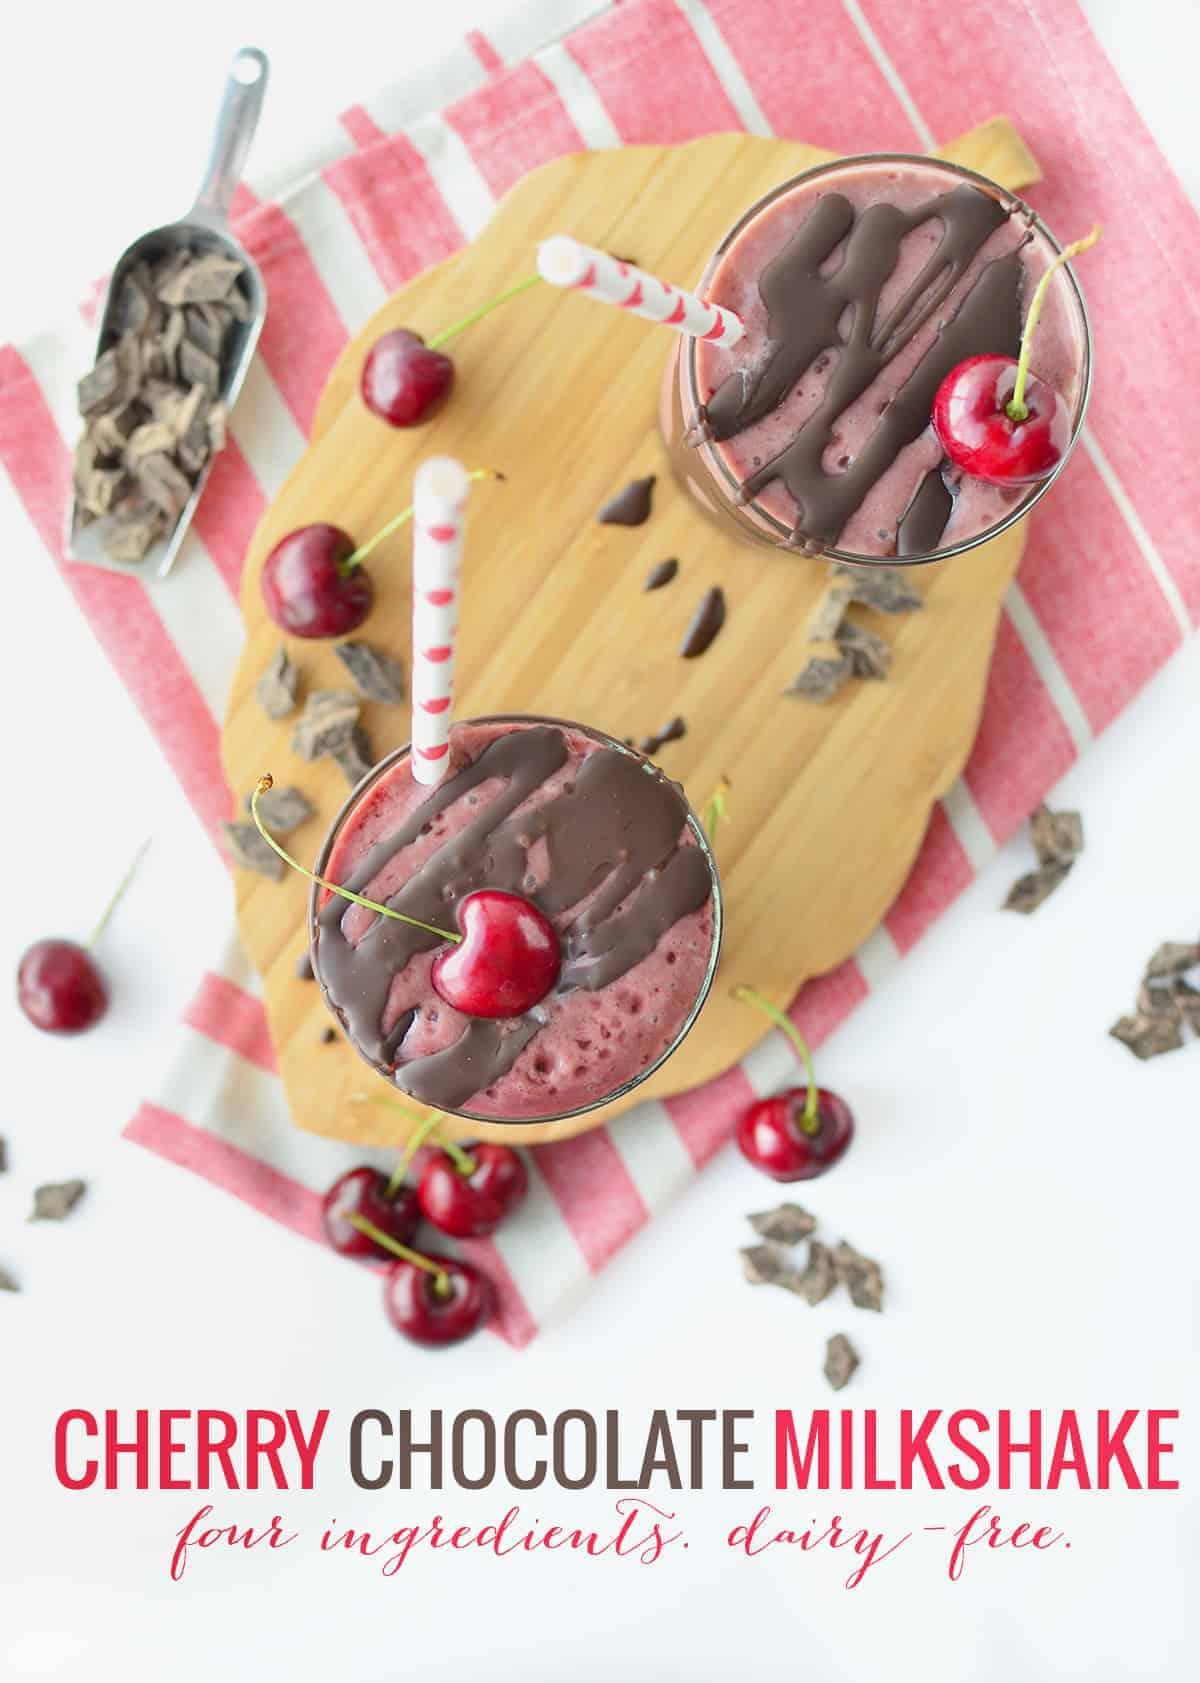 Chocolate Cherry Milkshakes! Just 4 ingredients, naturally sweetened and dairy-free! Everybody will love these, you've gotta make them. #vegan #dairyfree #kidfriendly #dessert   www.delishknowledge.com